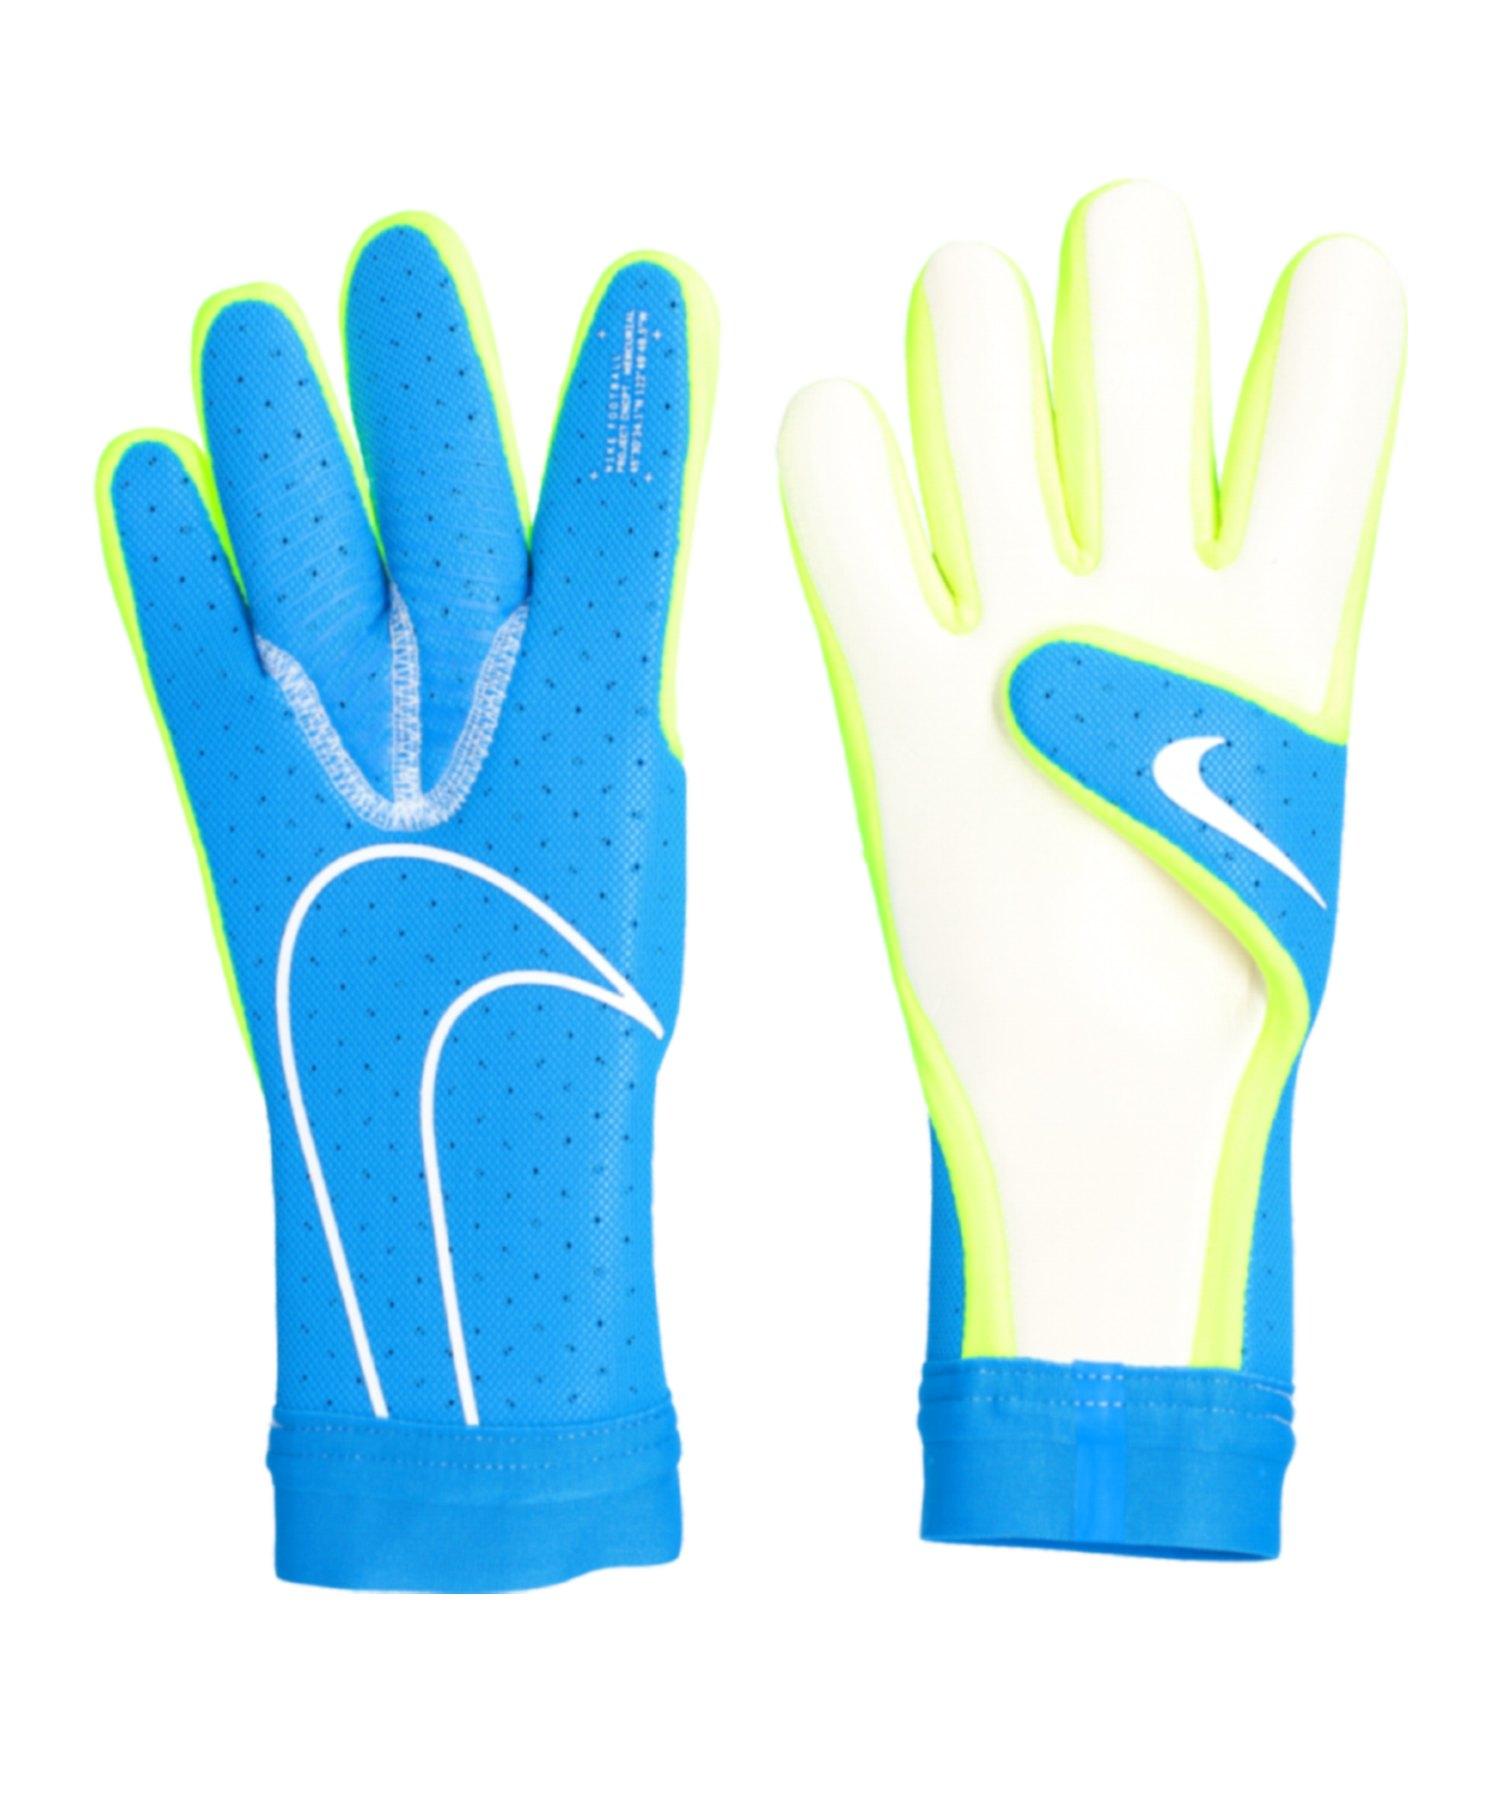 Nike Mercurial Touch Elite Promo TW-Handschuh F430 - blau